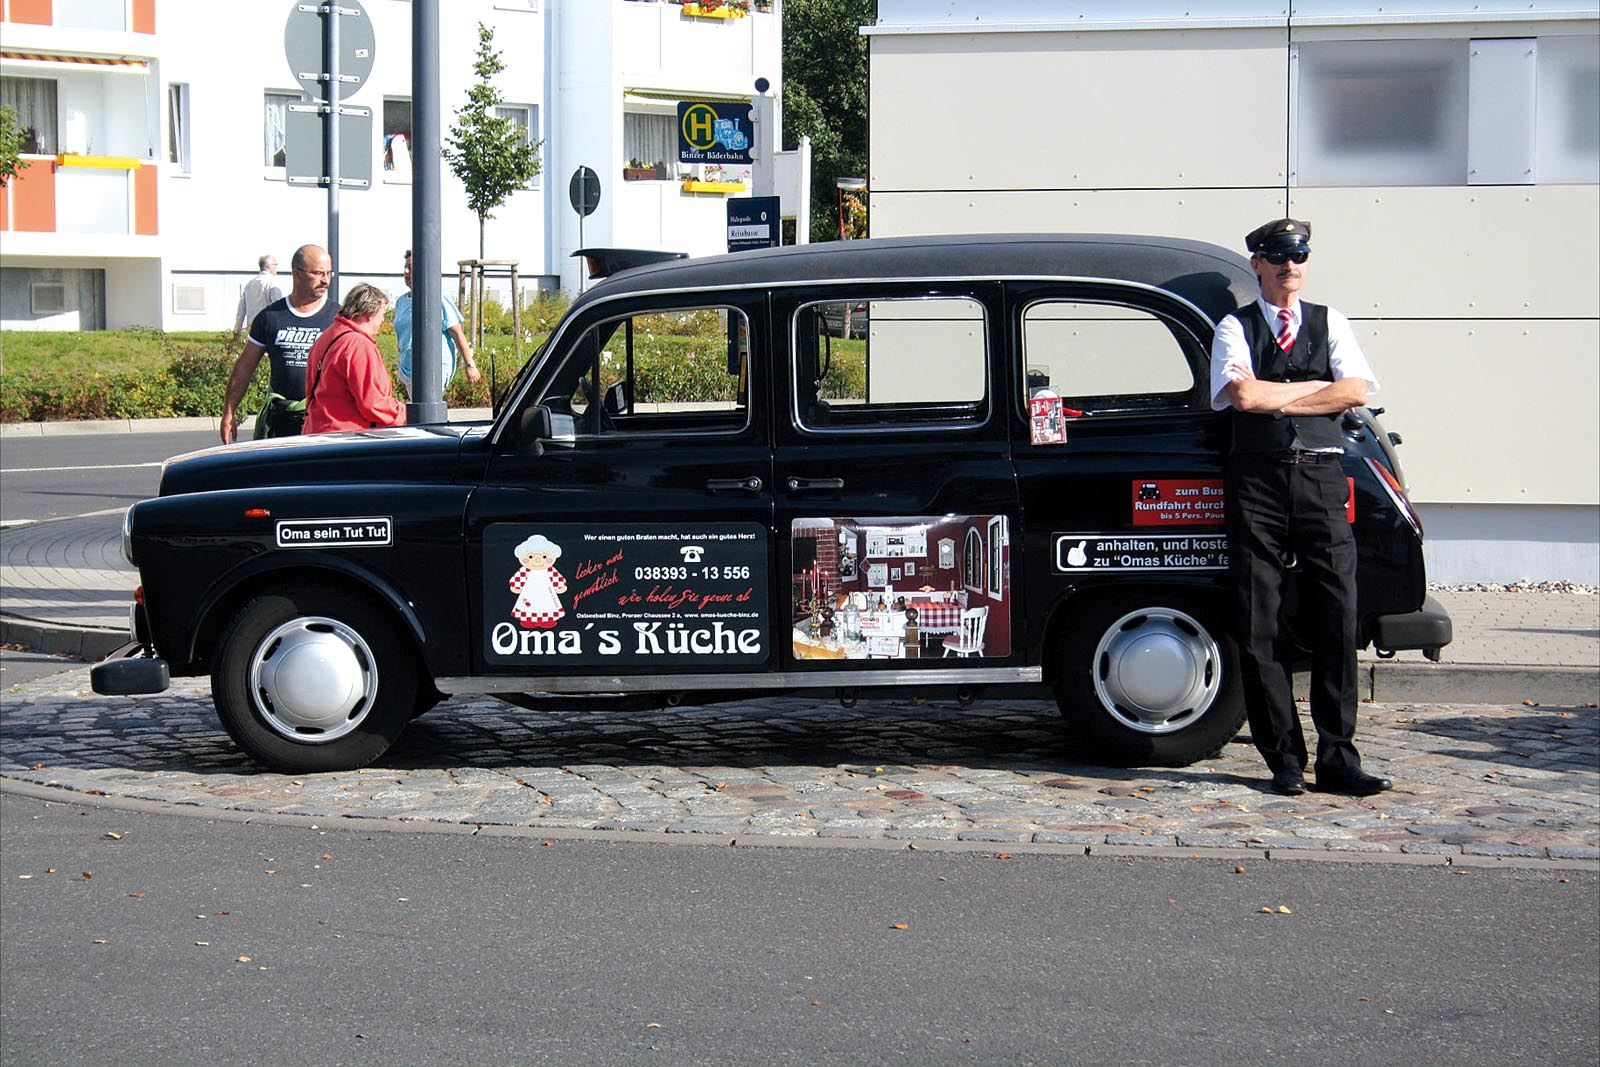 33_29_chauffeur_limousine_ruegen_2